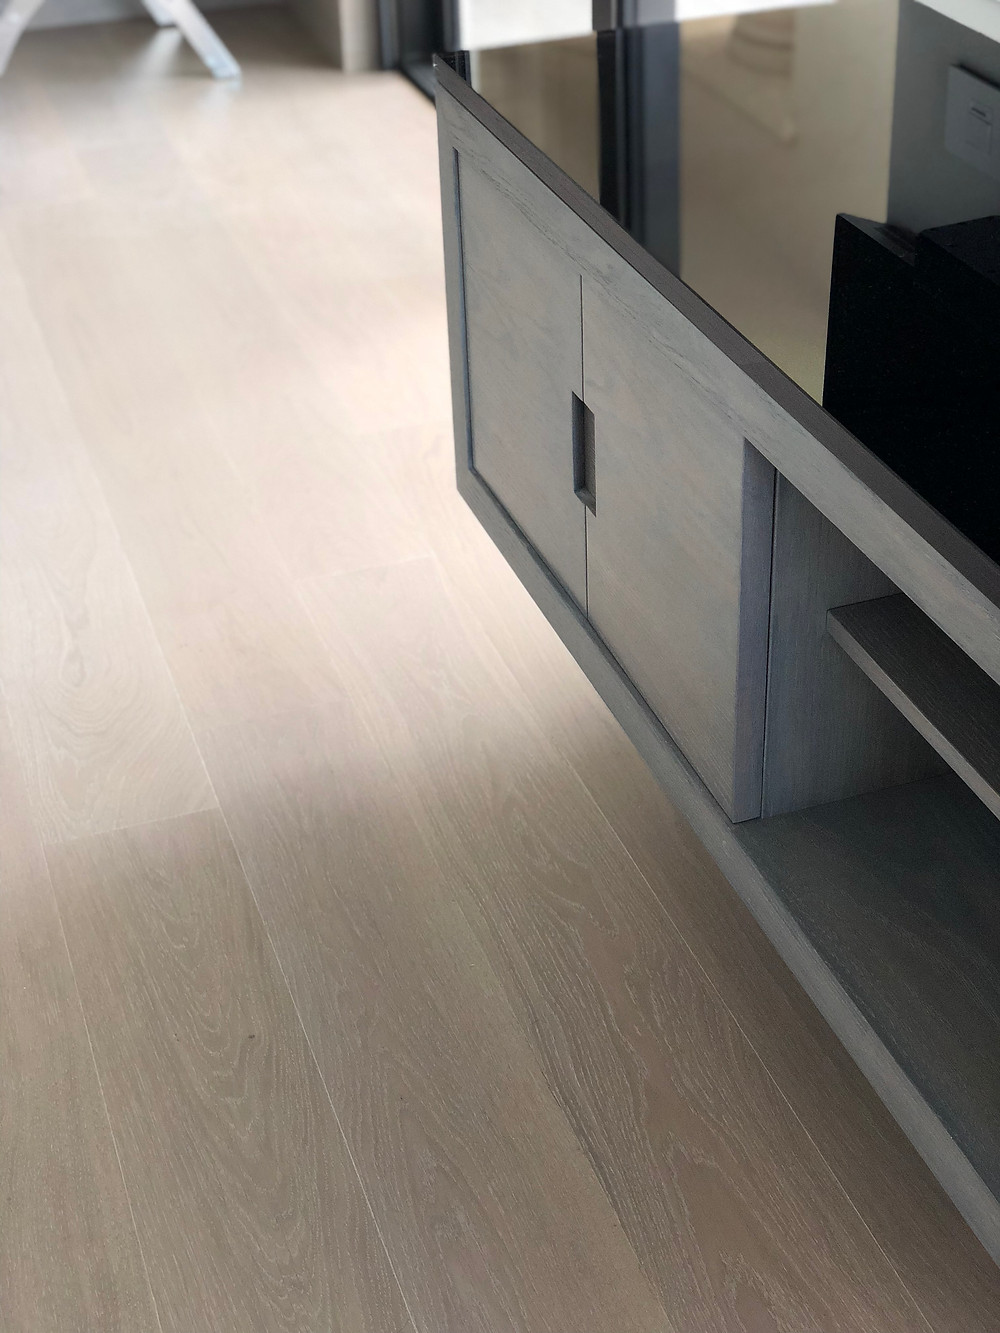 White wash hardwood flooring trends 2021